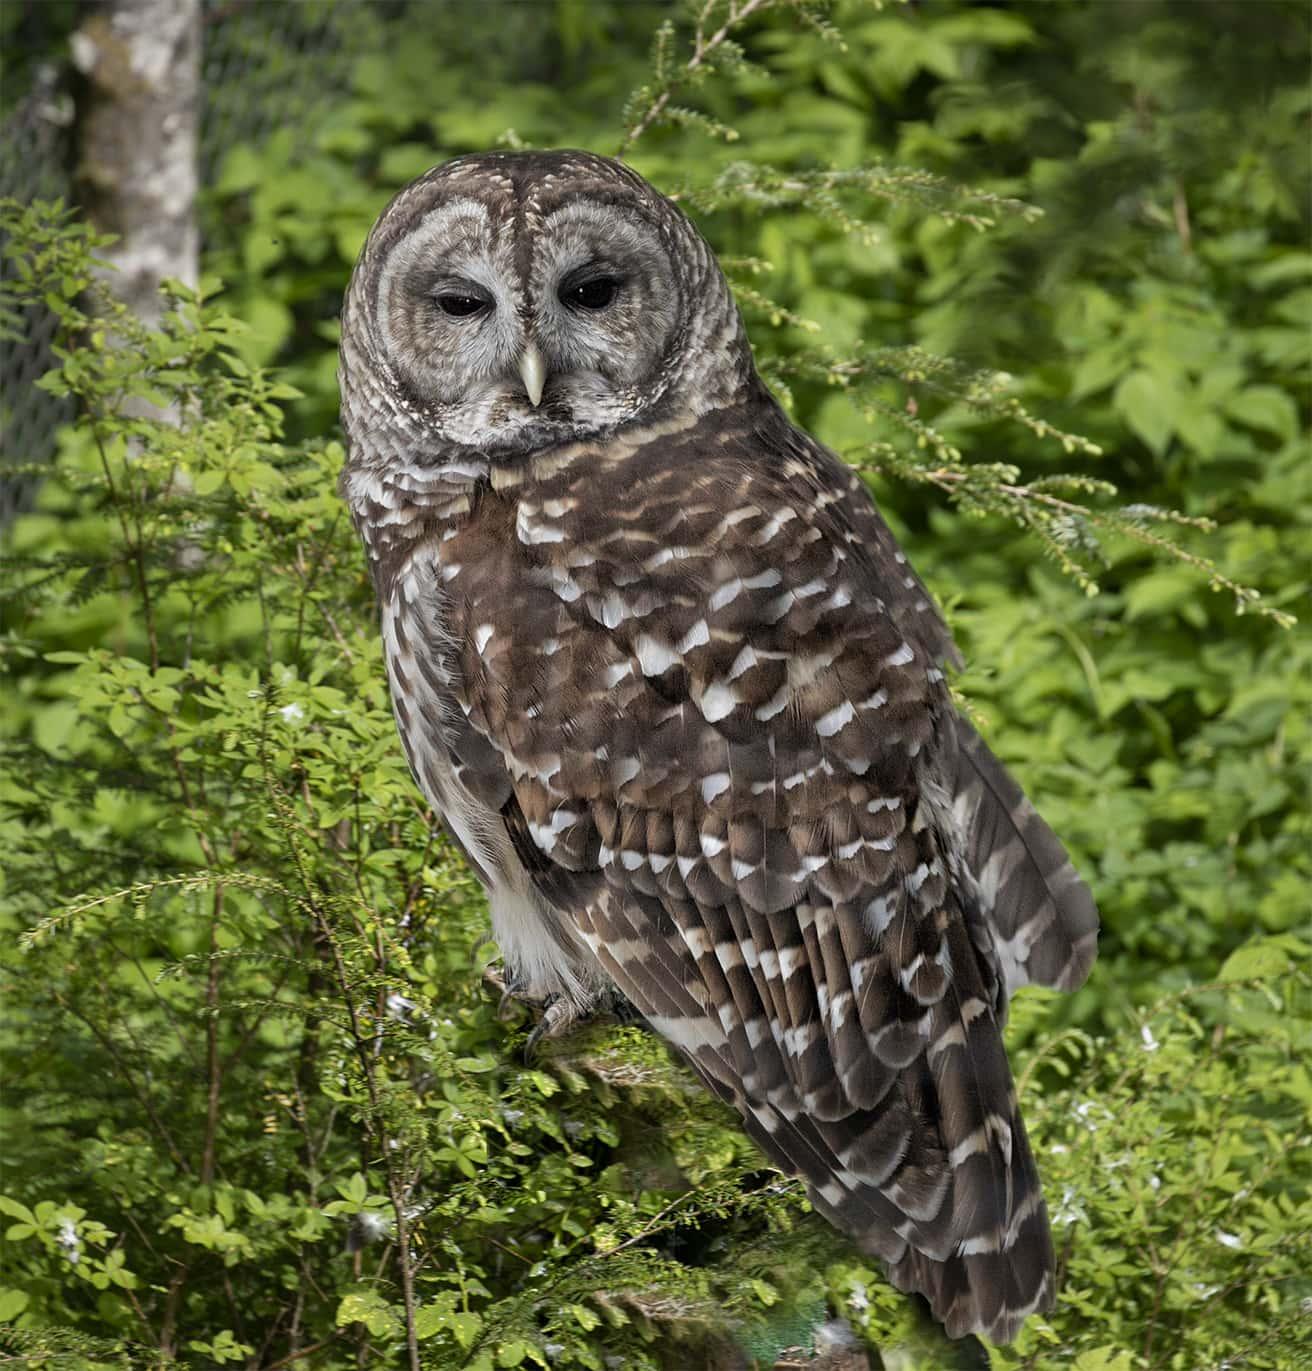 Alaskan Spotted Owl at Sikta Raptor Center